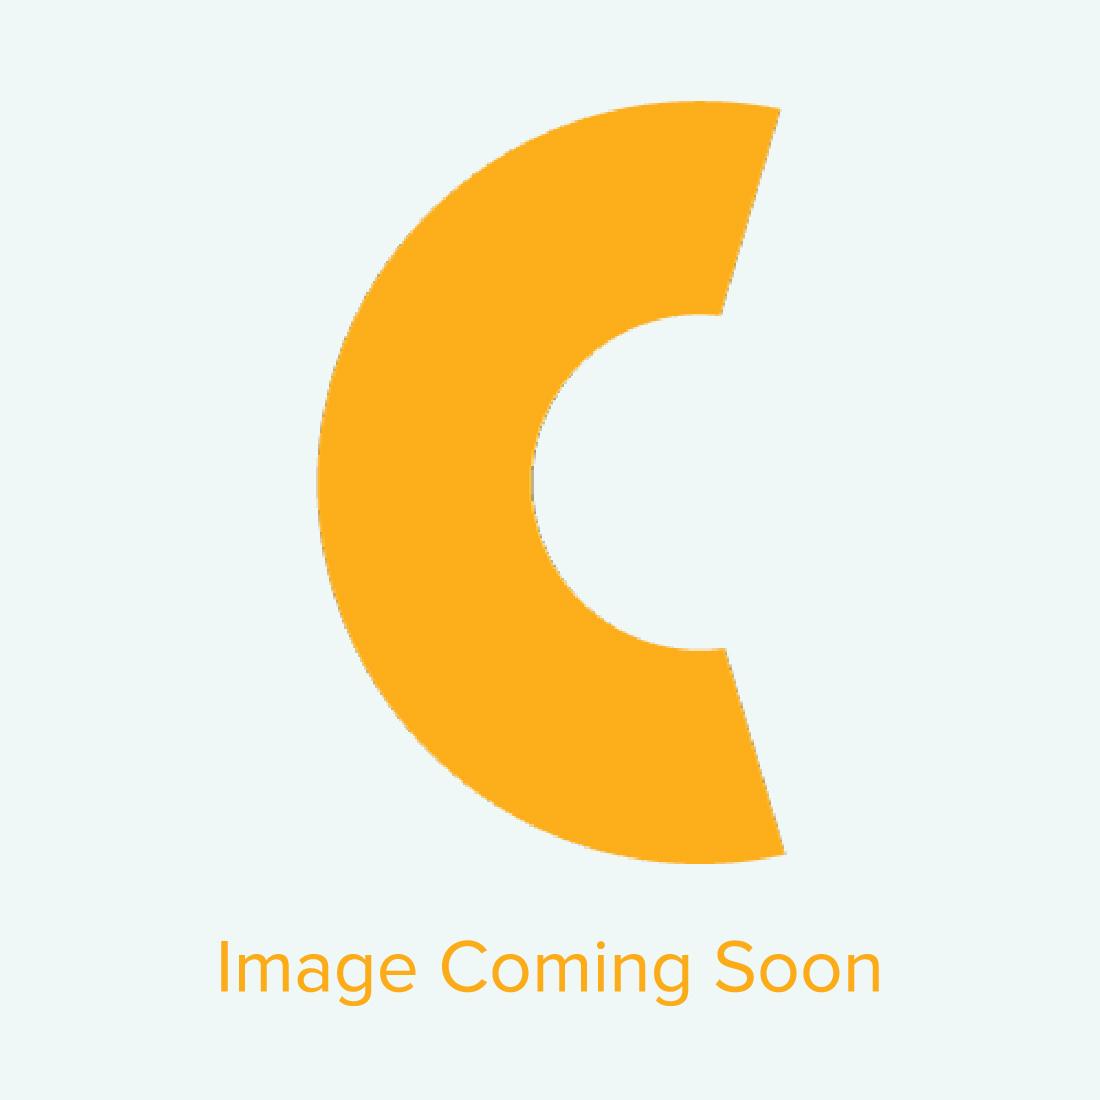 Epson R1900 - ChromaBlast Quick Connect Kit